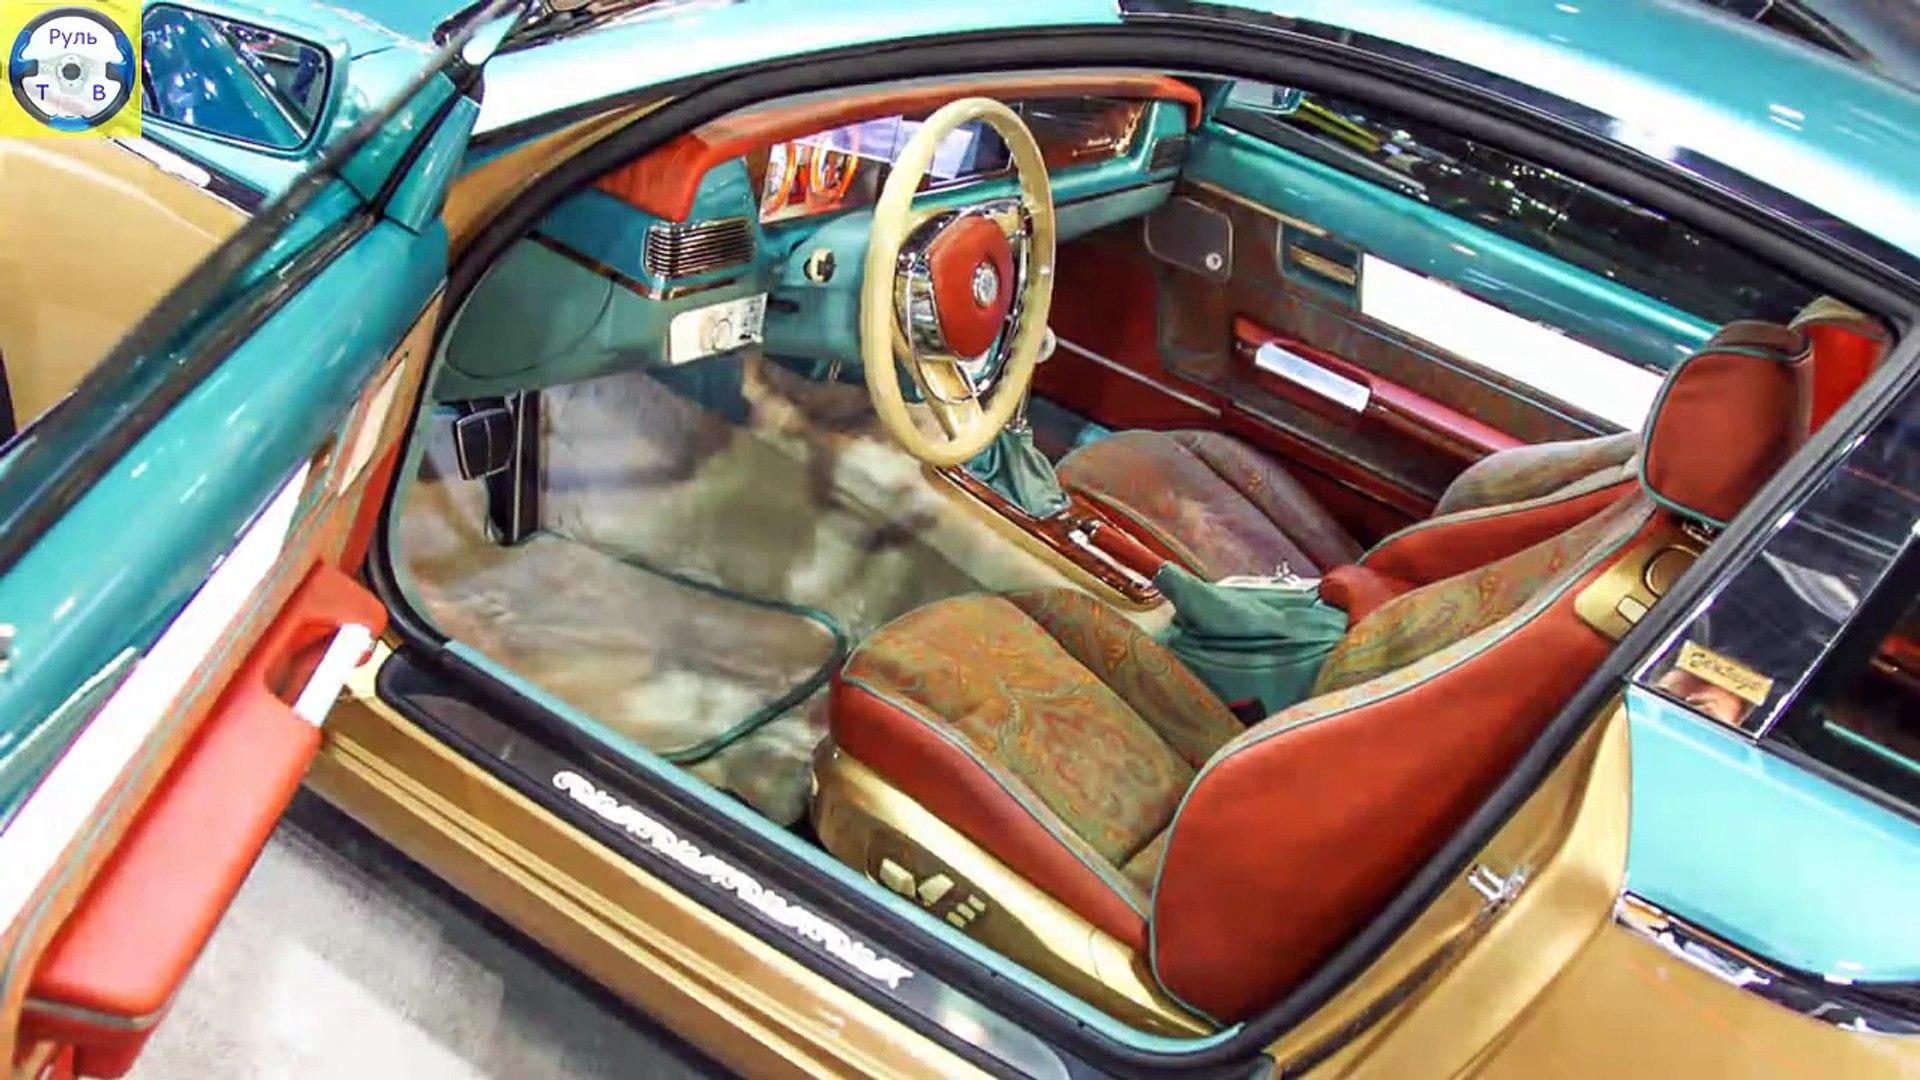 Ретро-кар на базе BMW 335i и BMW 330d Coupe. Bilenkin Classic Cars Vintage #ЧУДОТЕХНИКИ №1